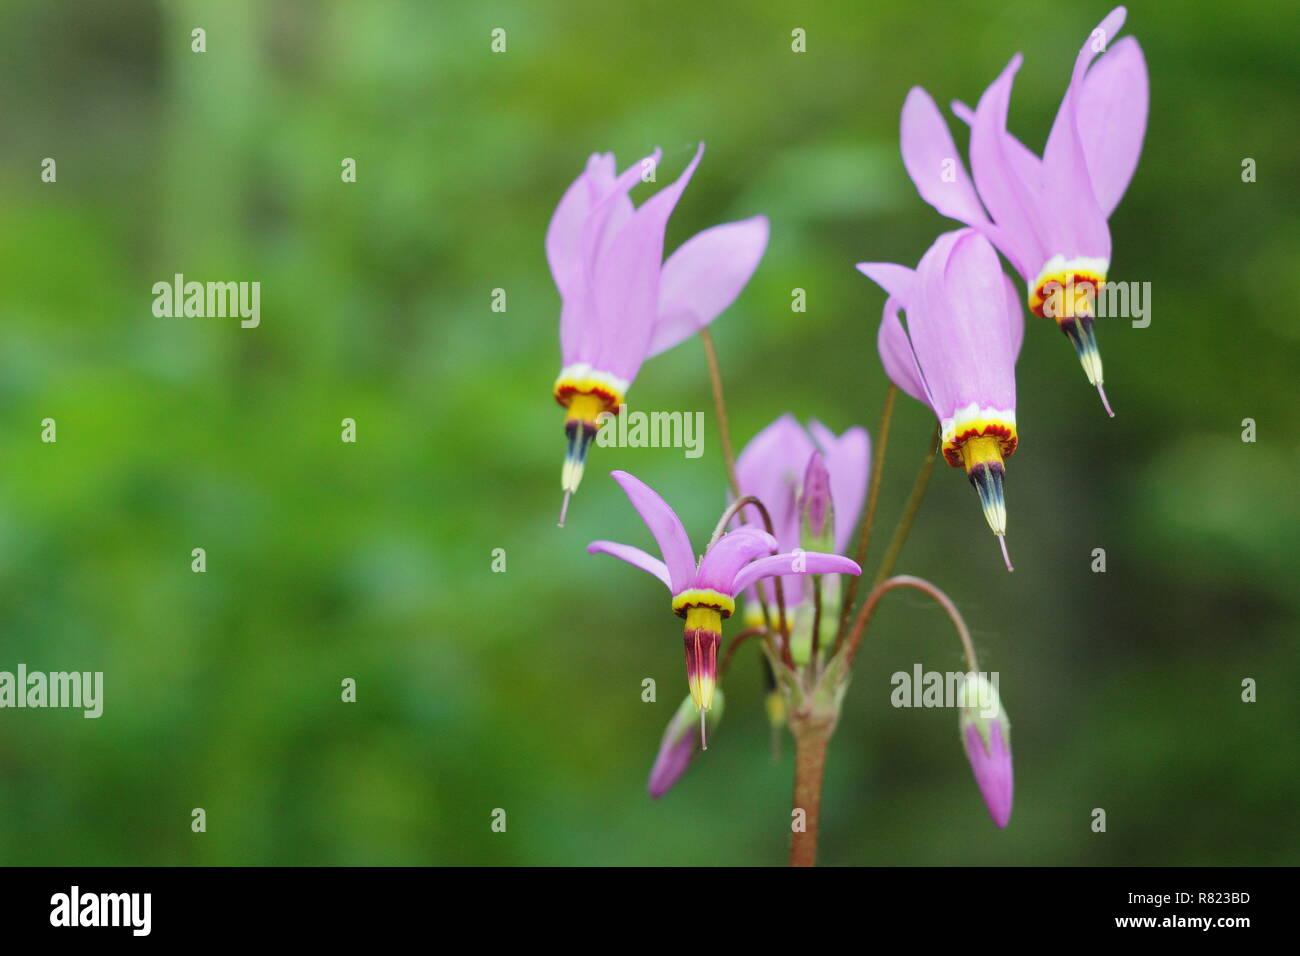 Dodecatheon pulchellum Dark throat flower. Also called Pretty shooting star and Prairie shooting star. - Stock Image